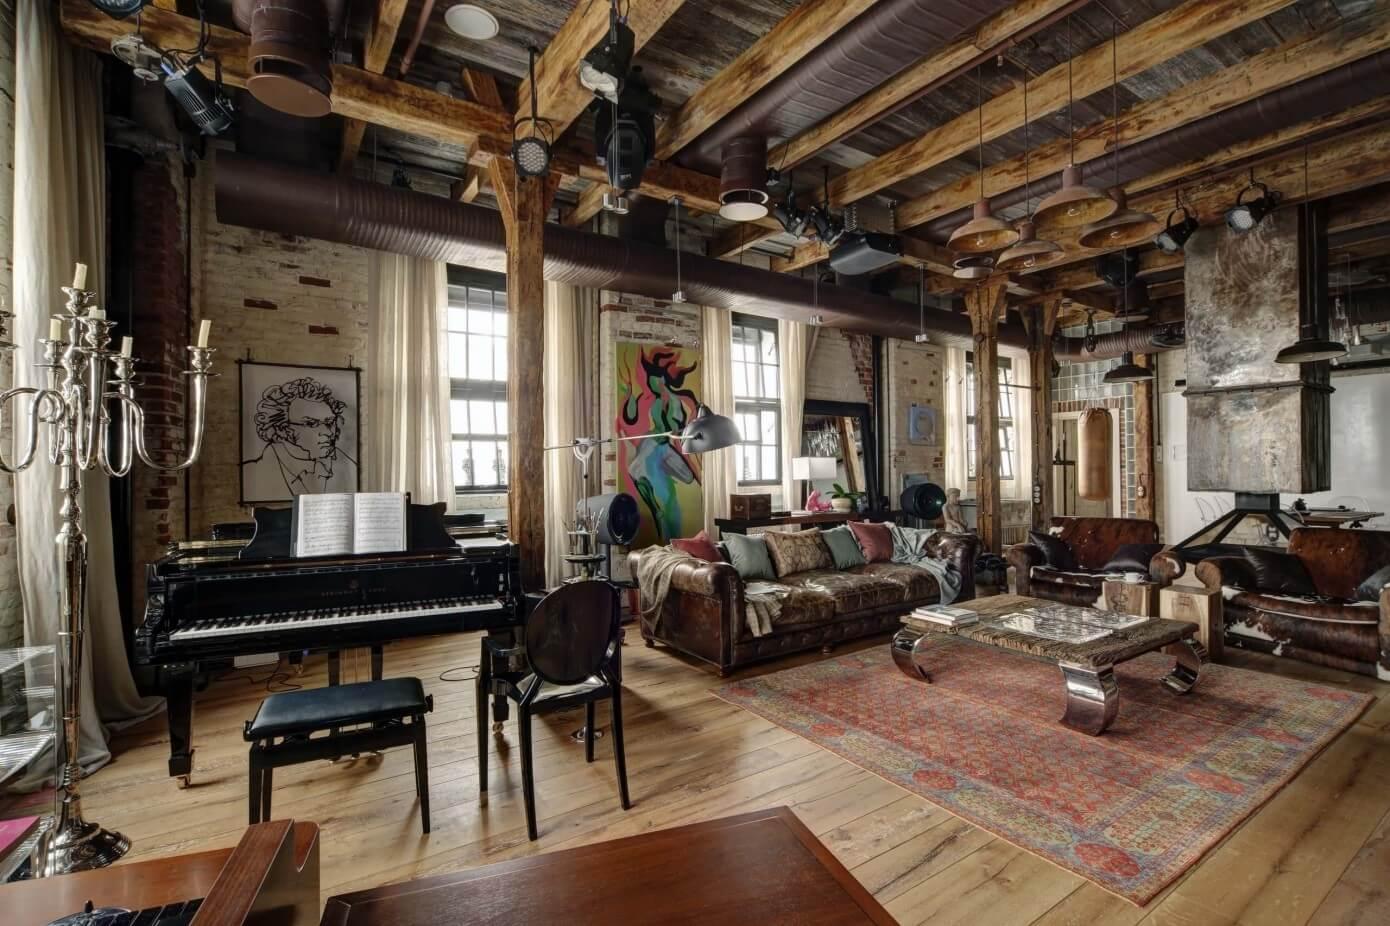 midlife crisis loft by lev lugovskoy homeadore. Black Bedroom Furniture Sets. Home Design Ideas